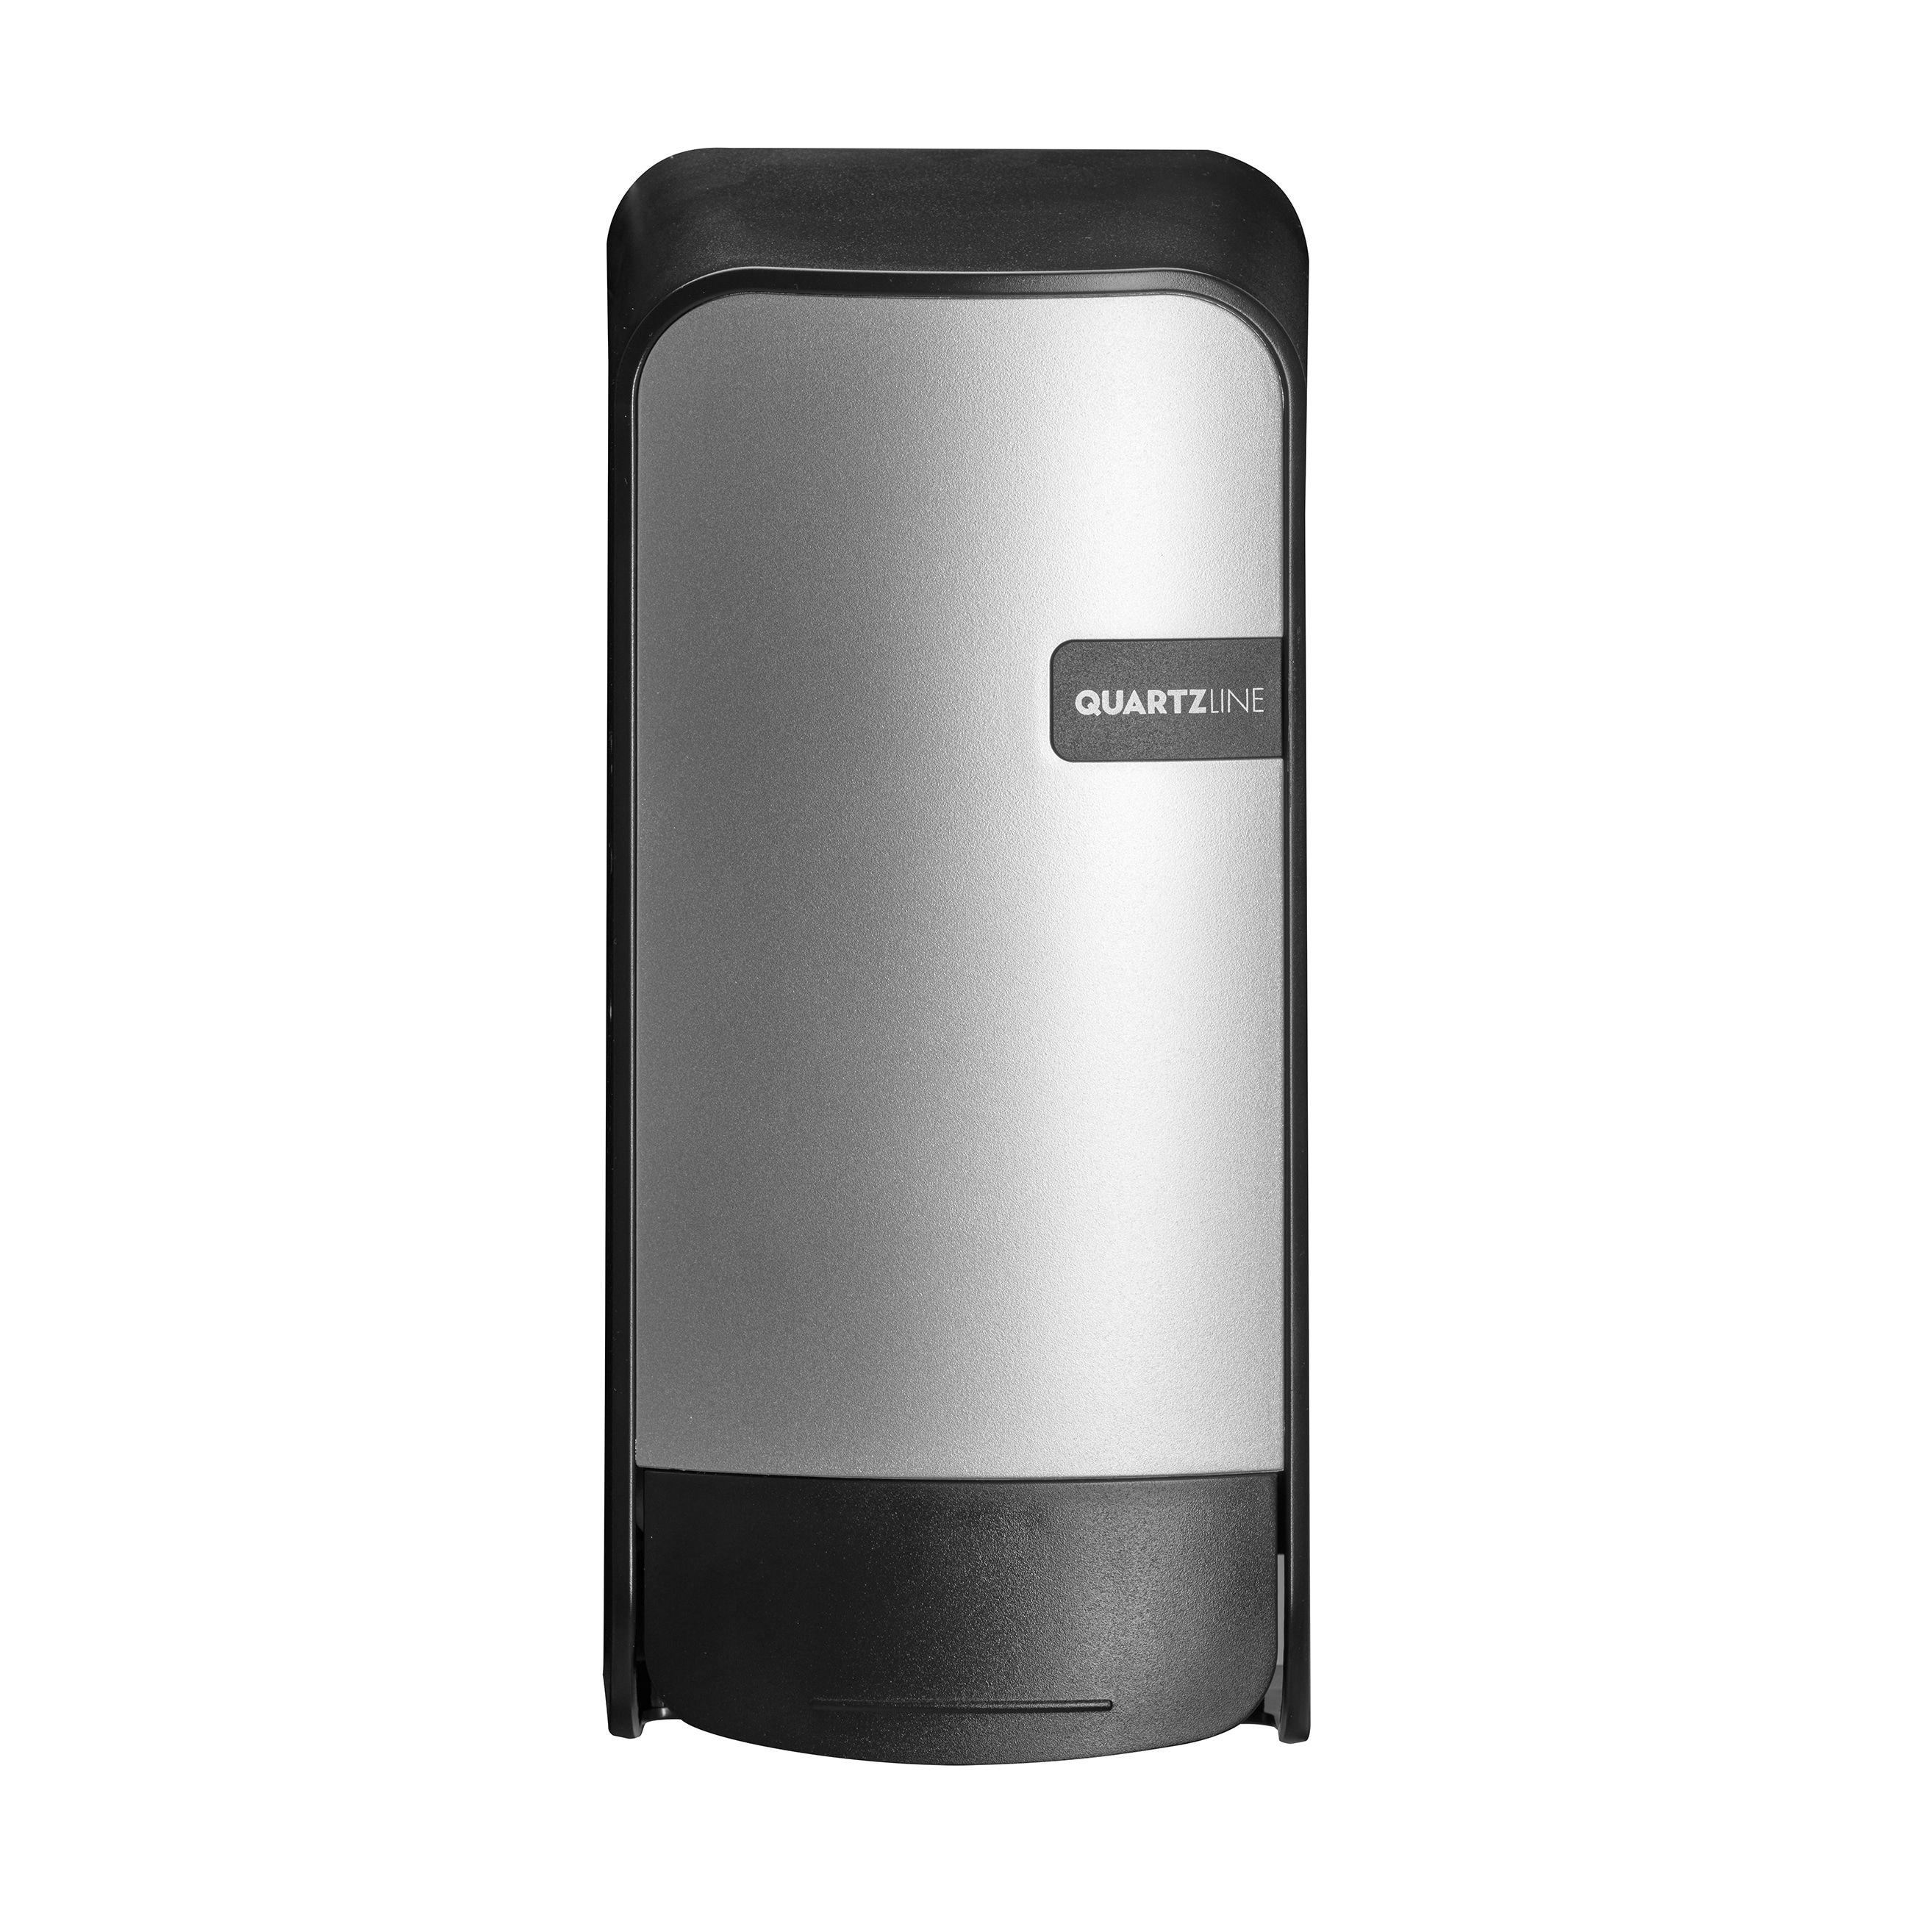 Quartz Silver 441292 Soap dispenser Bag in Box kunststof, navulbaar (441292)